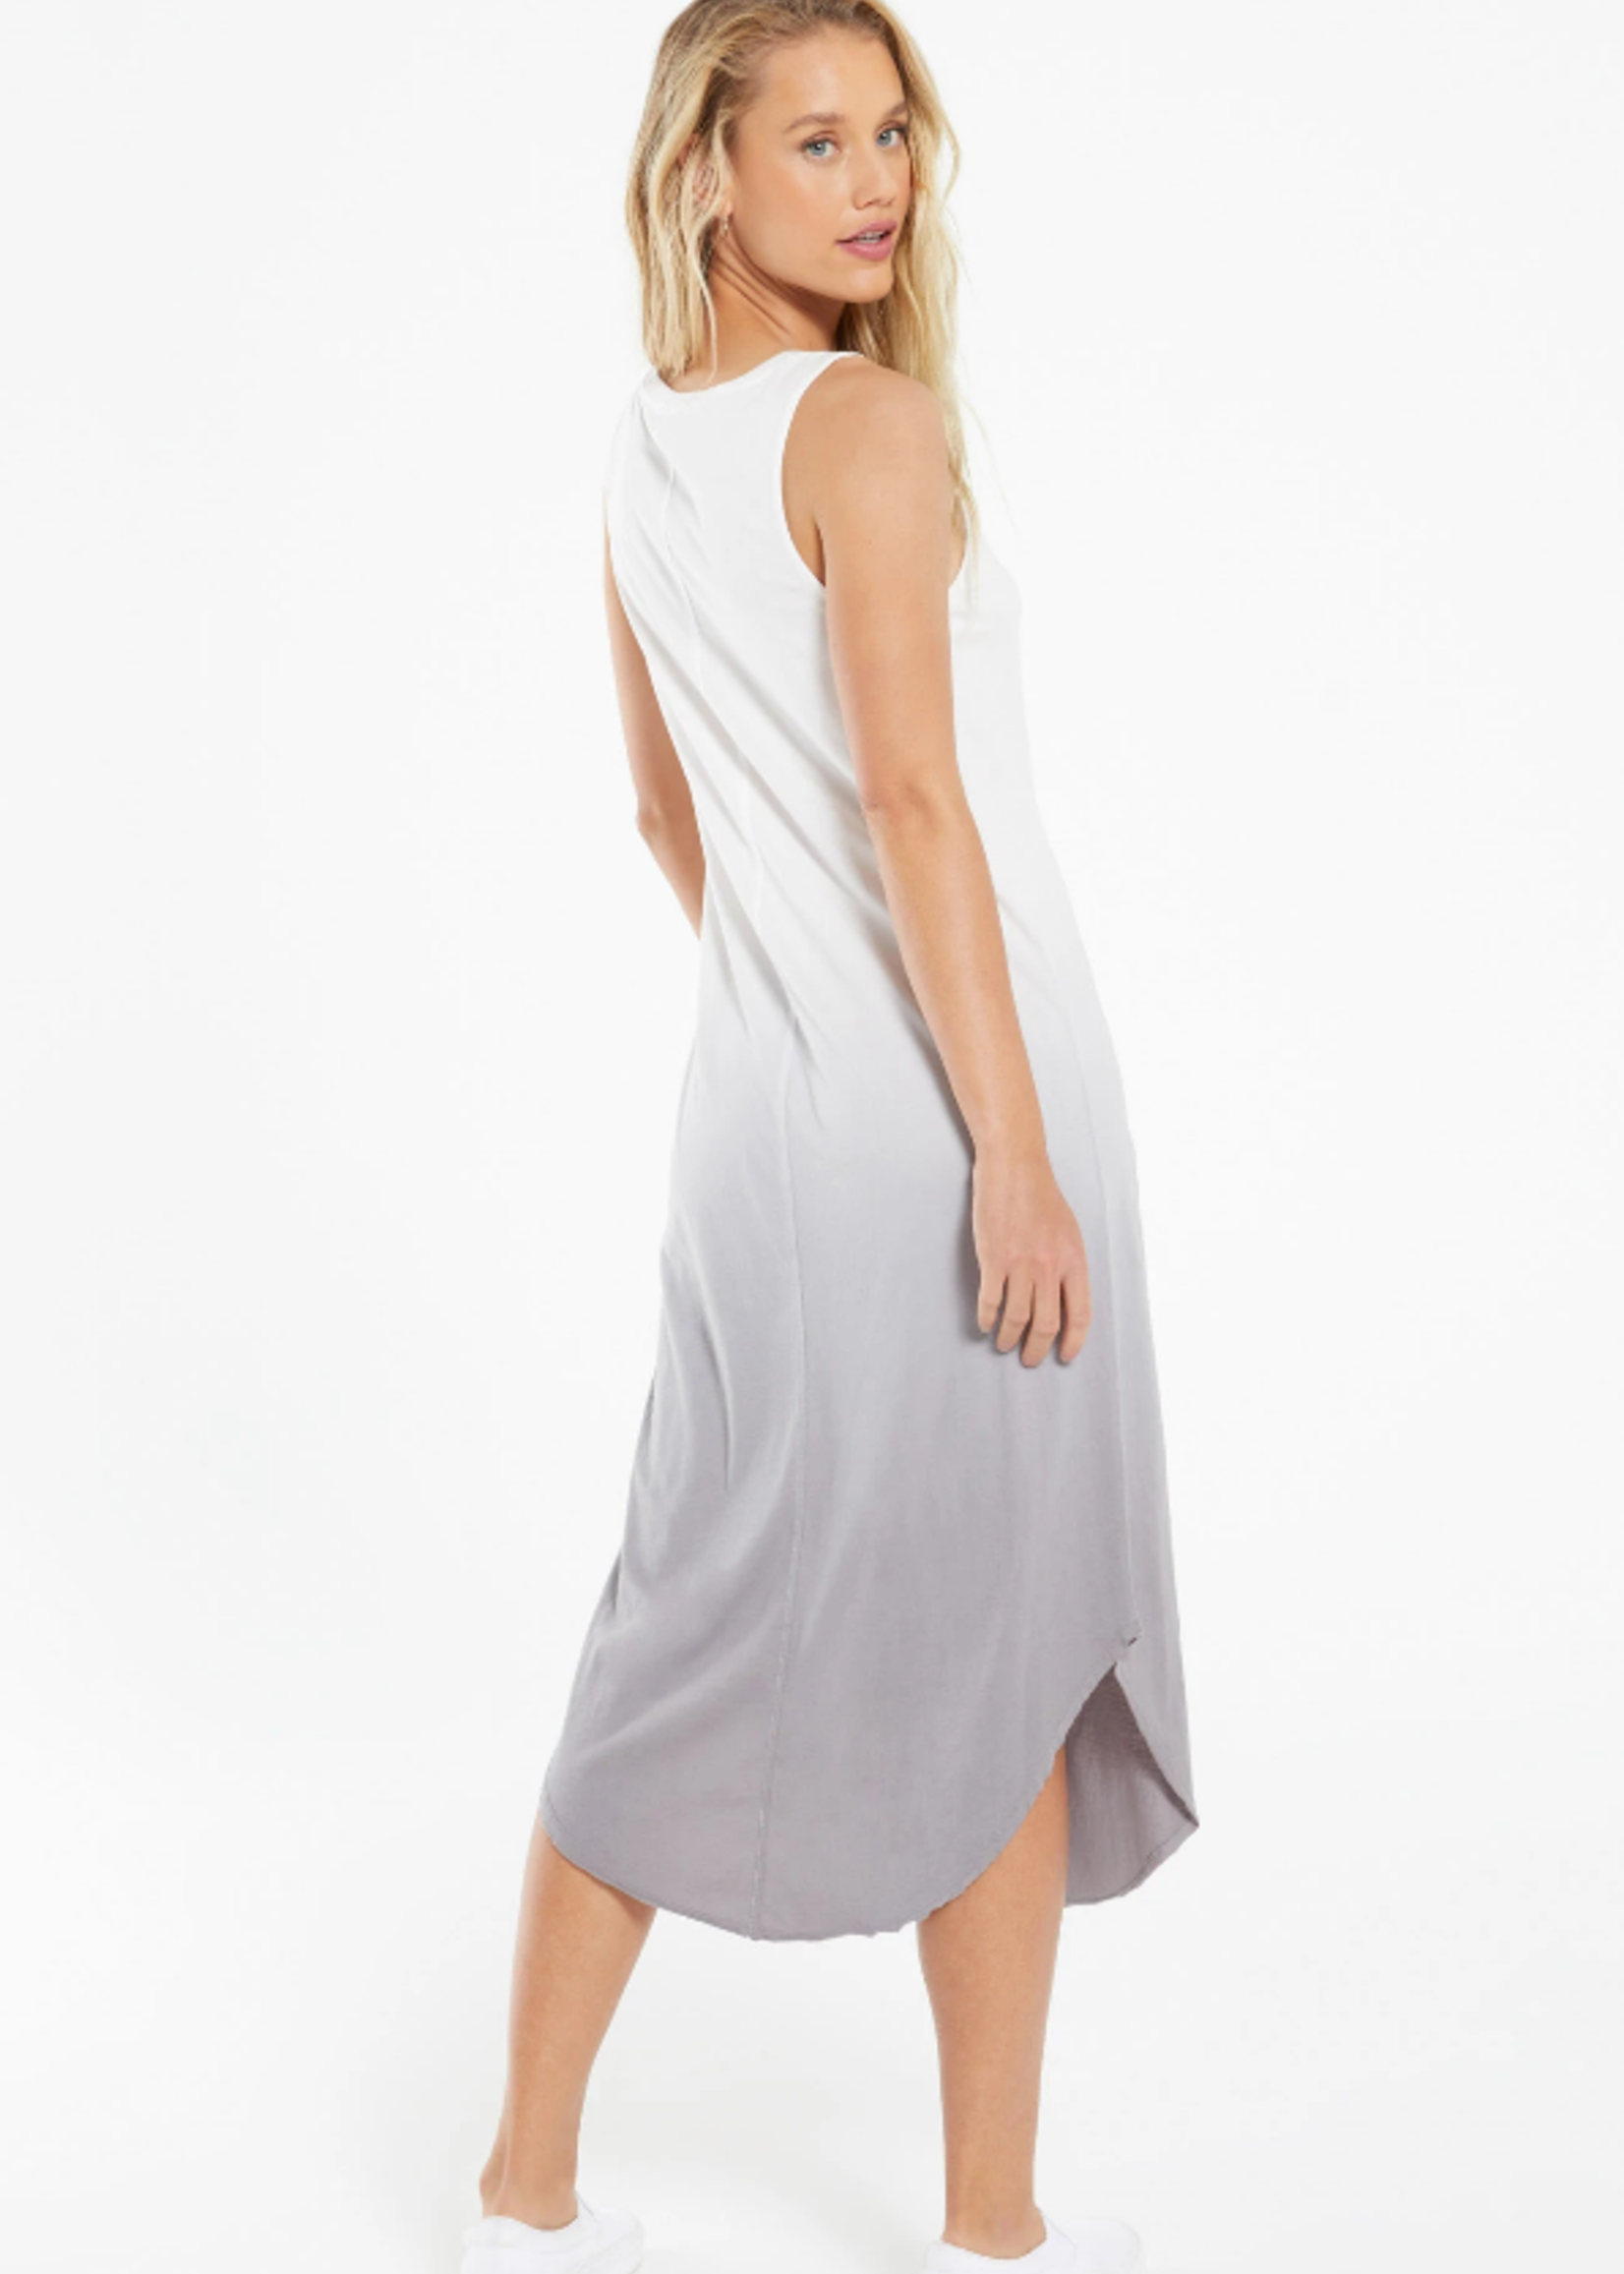 Z Supply Reverie Scoop Dip Dye Dress - Soft Grey